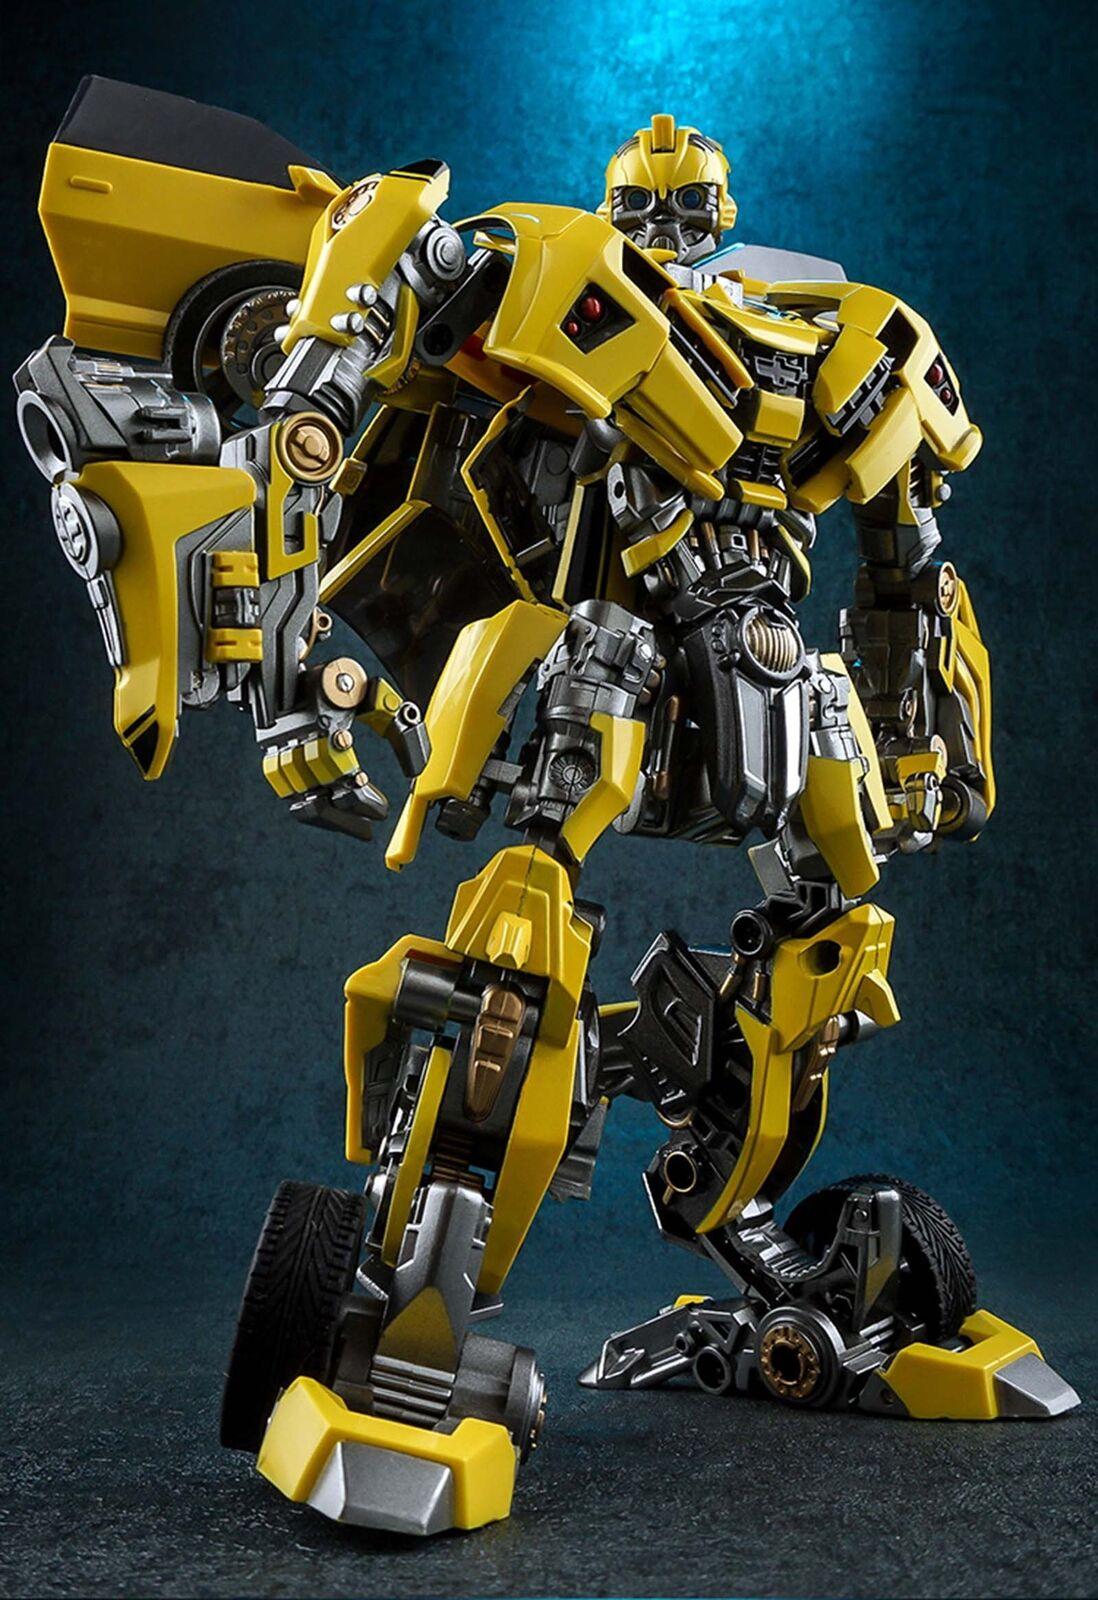 M03 Weijiang WJ Bumblebee Battle Hornet Transformers Figura De Acción Hot